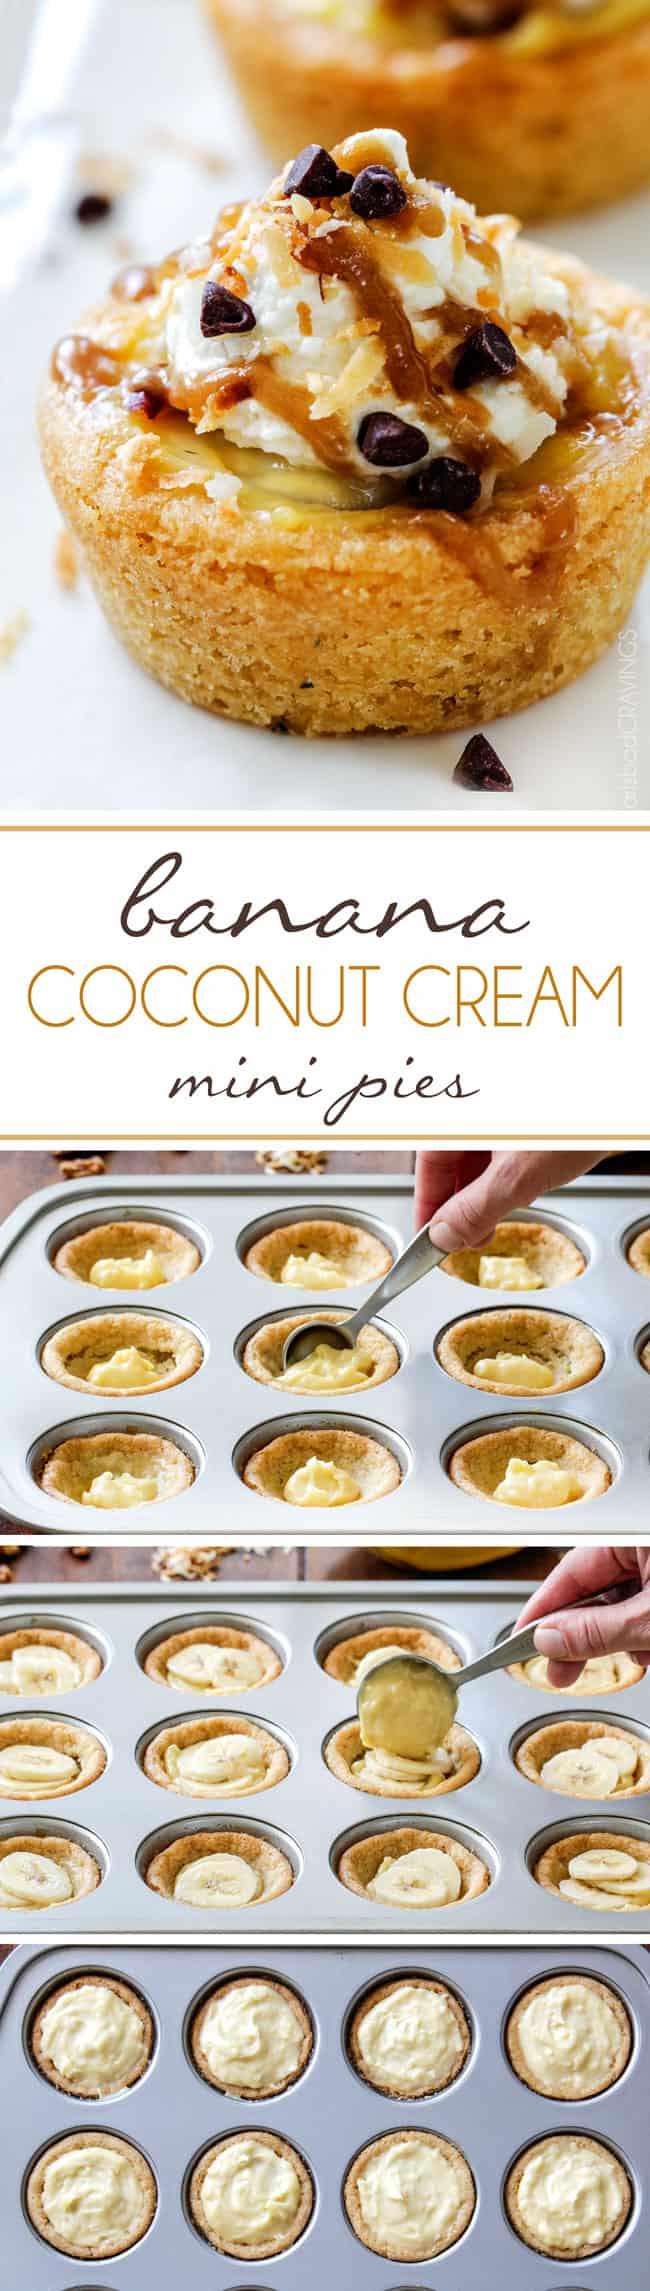 Banana-Coconut-Cream-Pies---collage